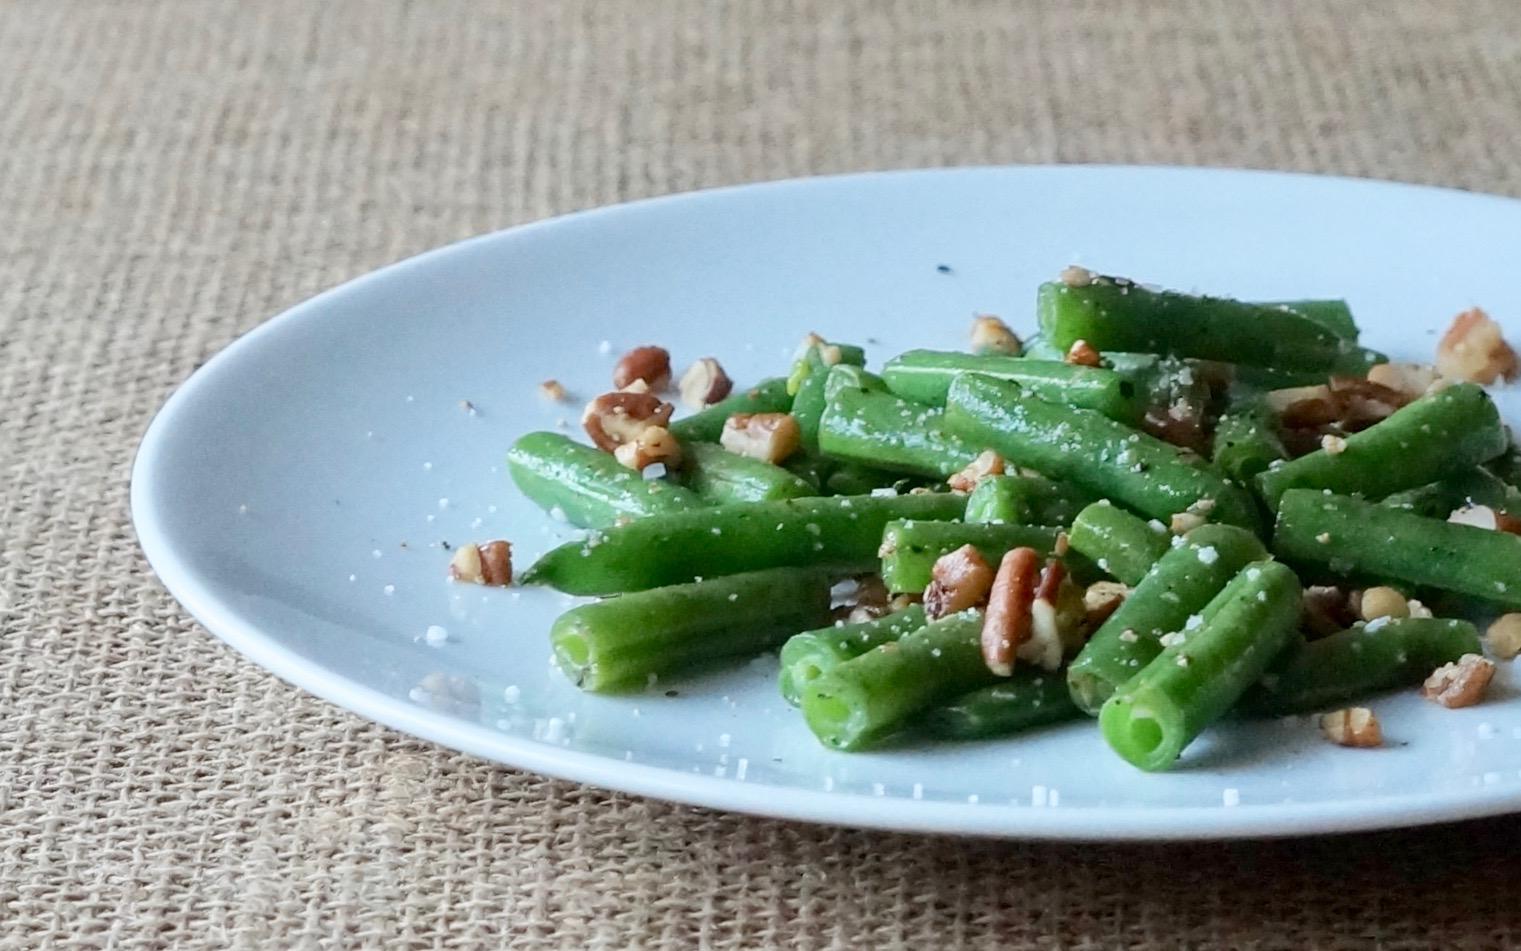 Buttered-Pecan-Green-Beans-Rebecca-Gordon-Publisher-Buttermilk-Lipstick-Culinary-Entertaining-Techniques-Southern-Hostess-RebeccaGordon-Pastry-Chef-Birmingham-Alabama